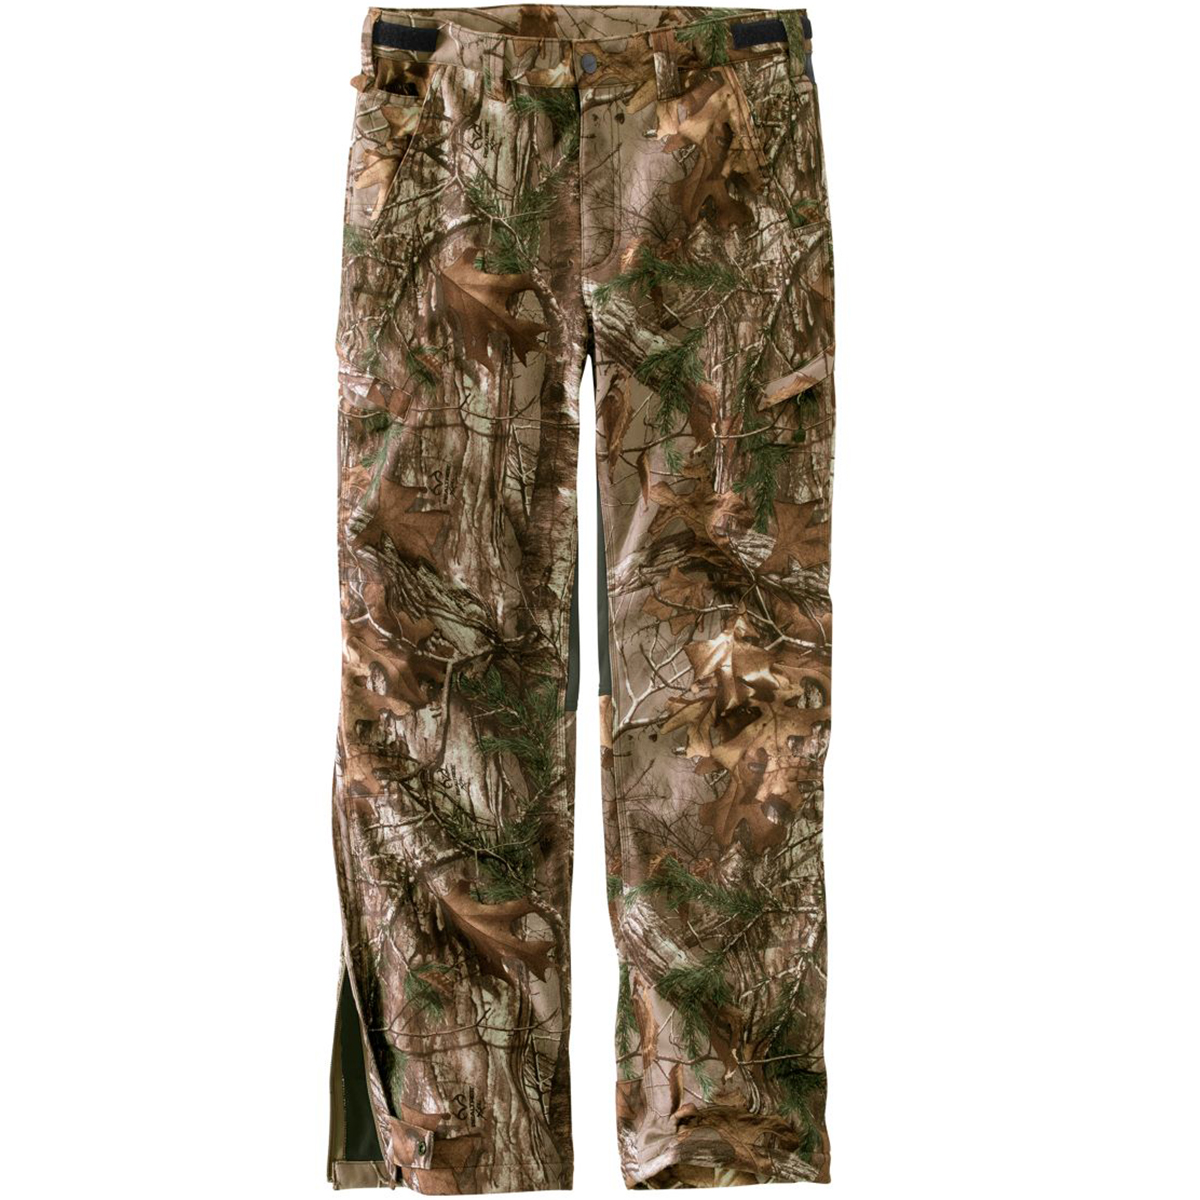 Carhartt Men's Buckfield Hunting Pant